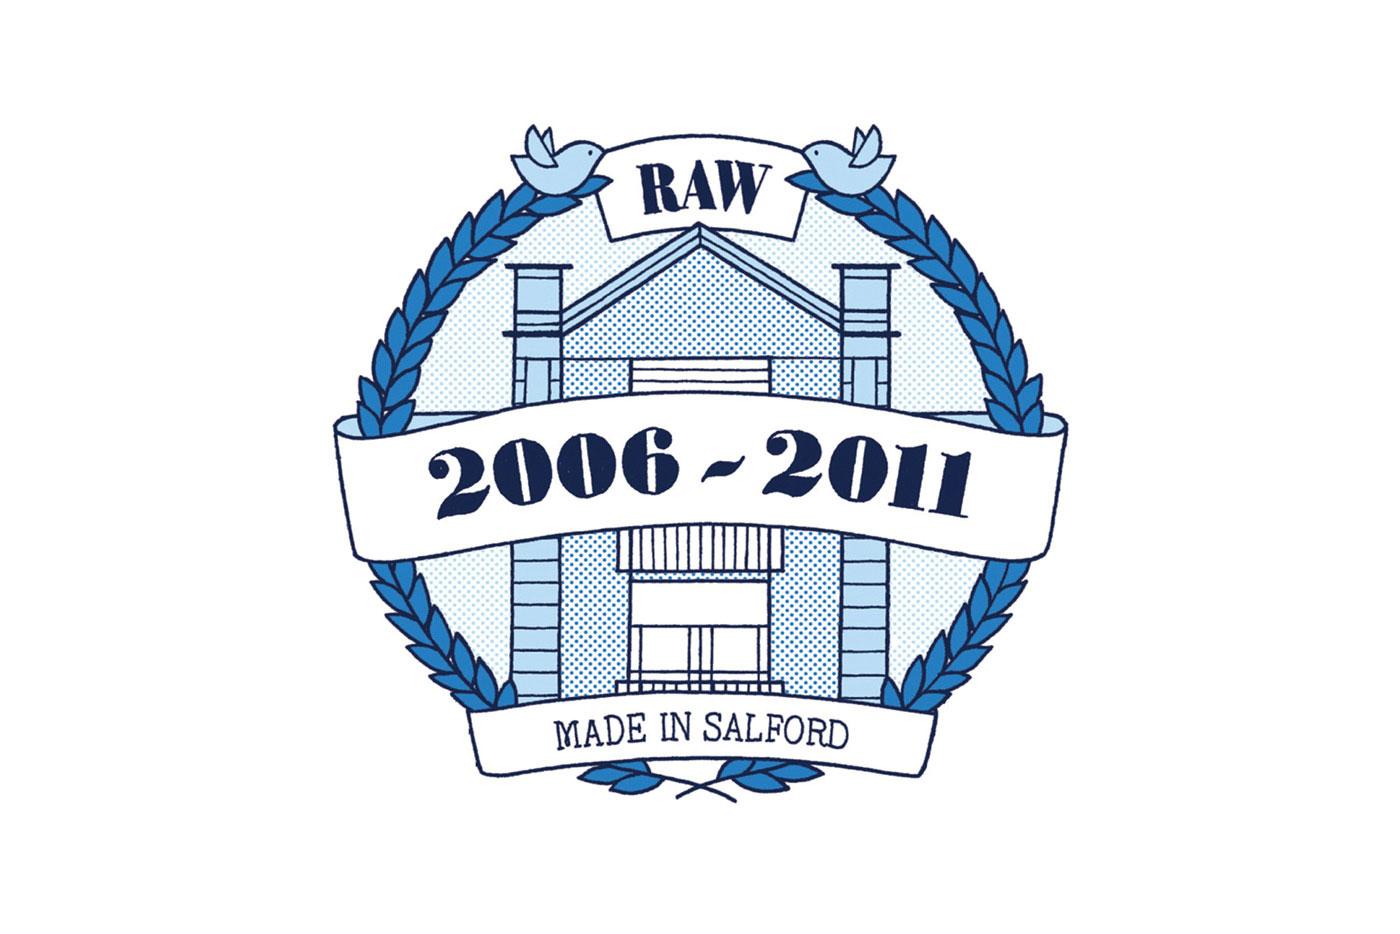 Raw 5 01